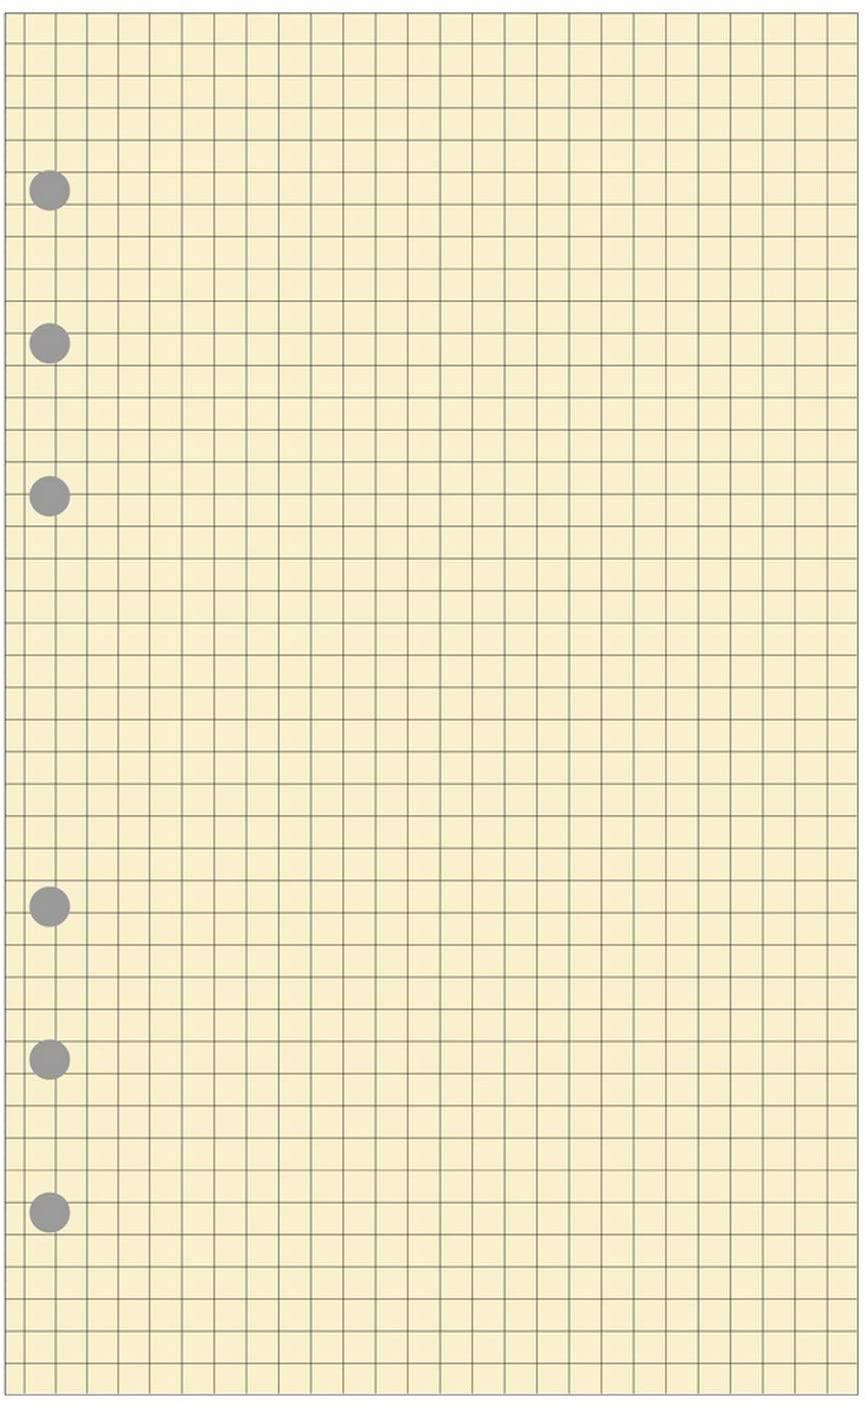 Exacompta–28211E–Squared Refill Pad for Exatime 21Organiser–40Sheets, Ivory